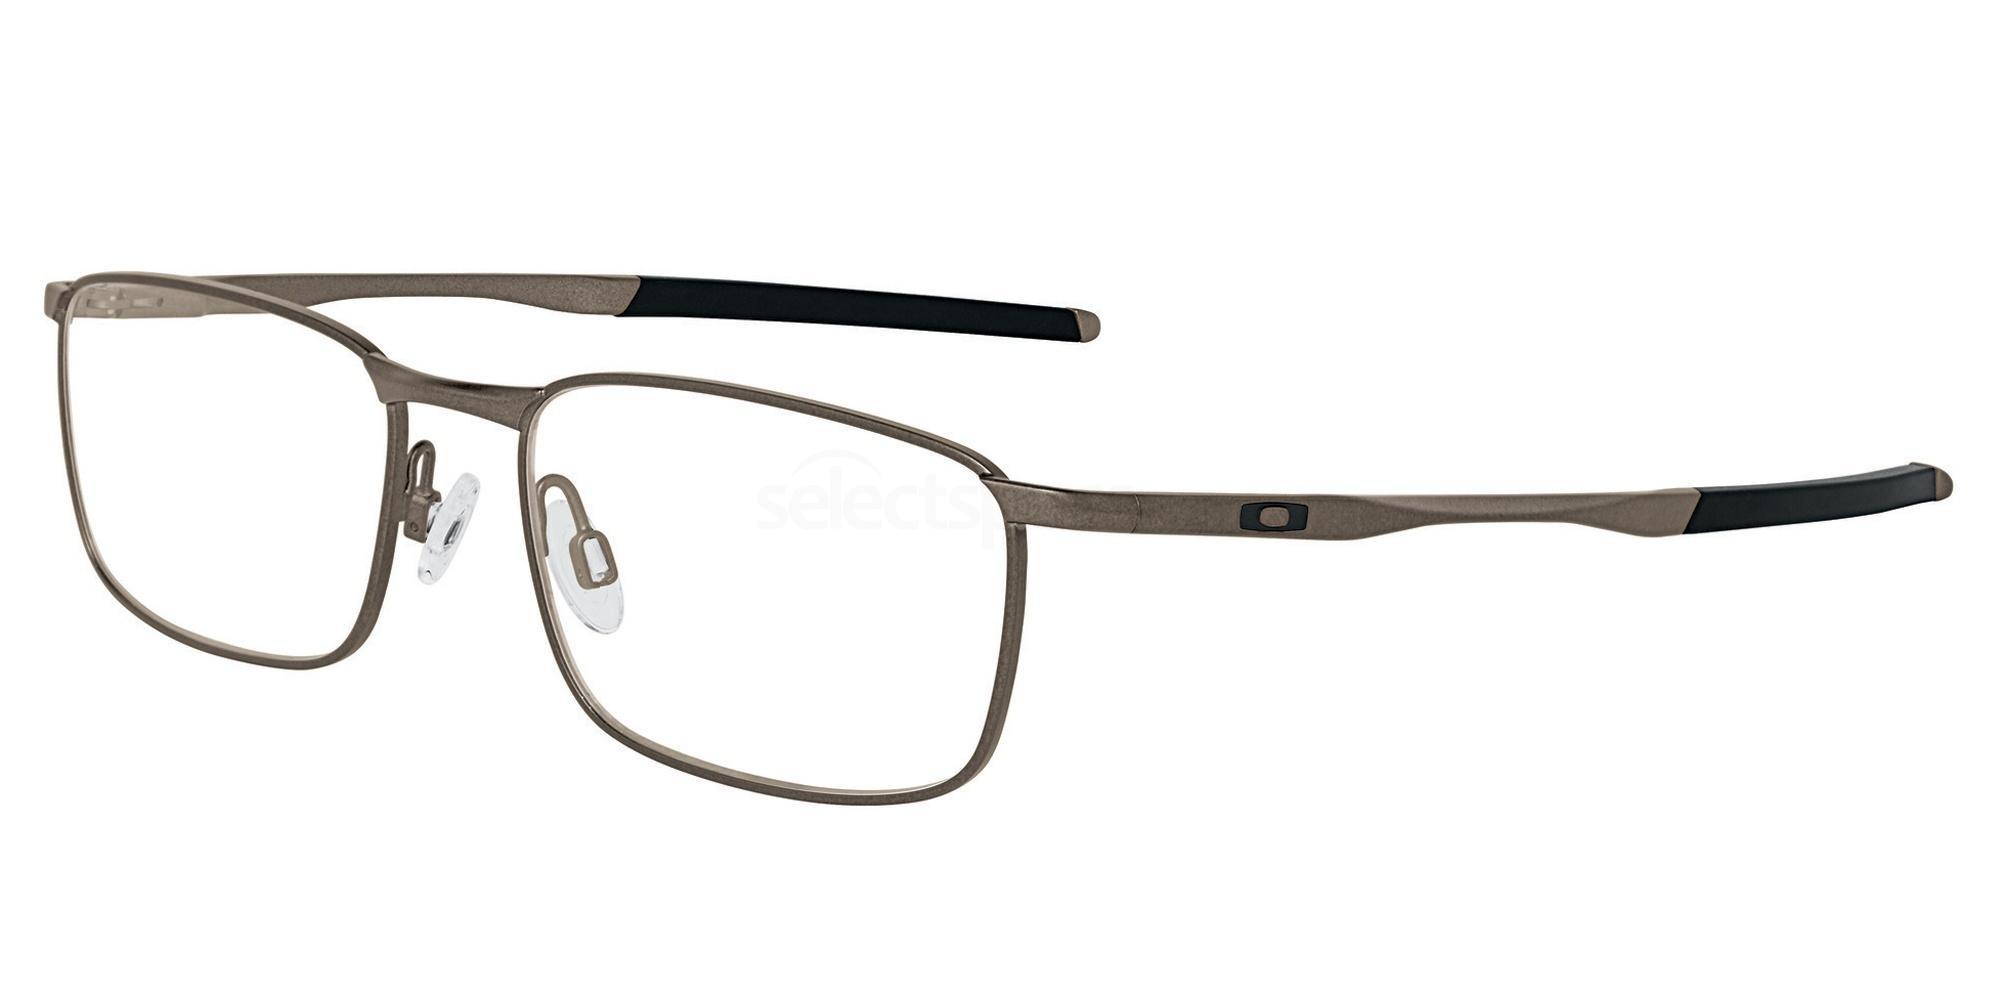 317302 OX3173 BARRELHOUSE Glasses, Oakley